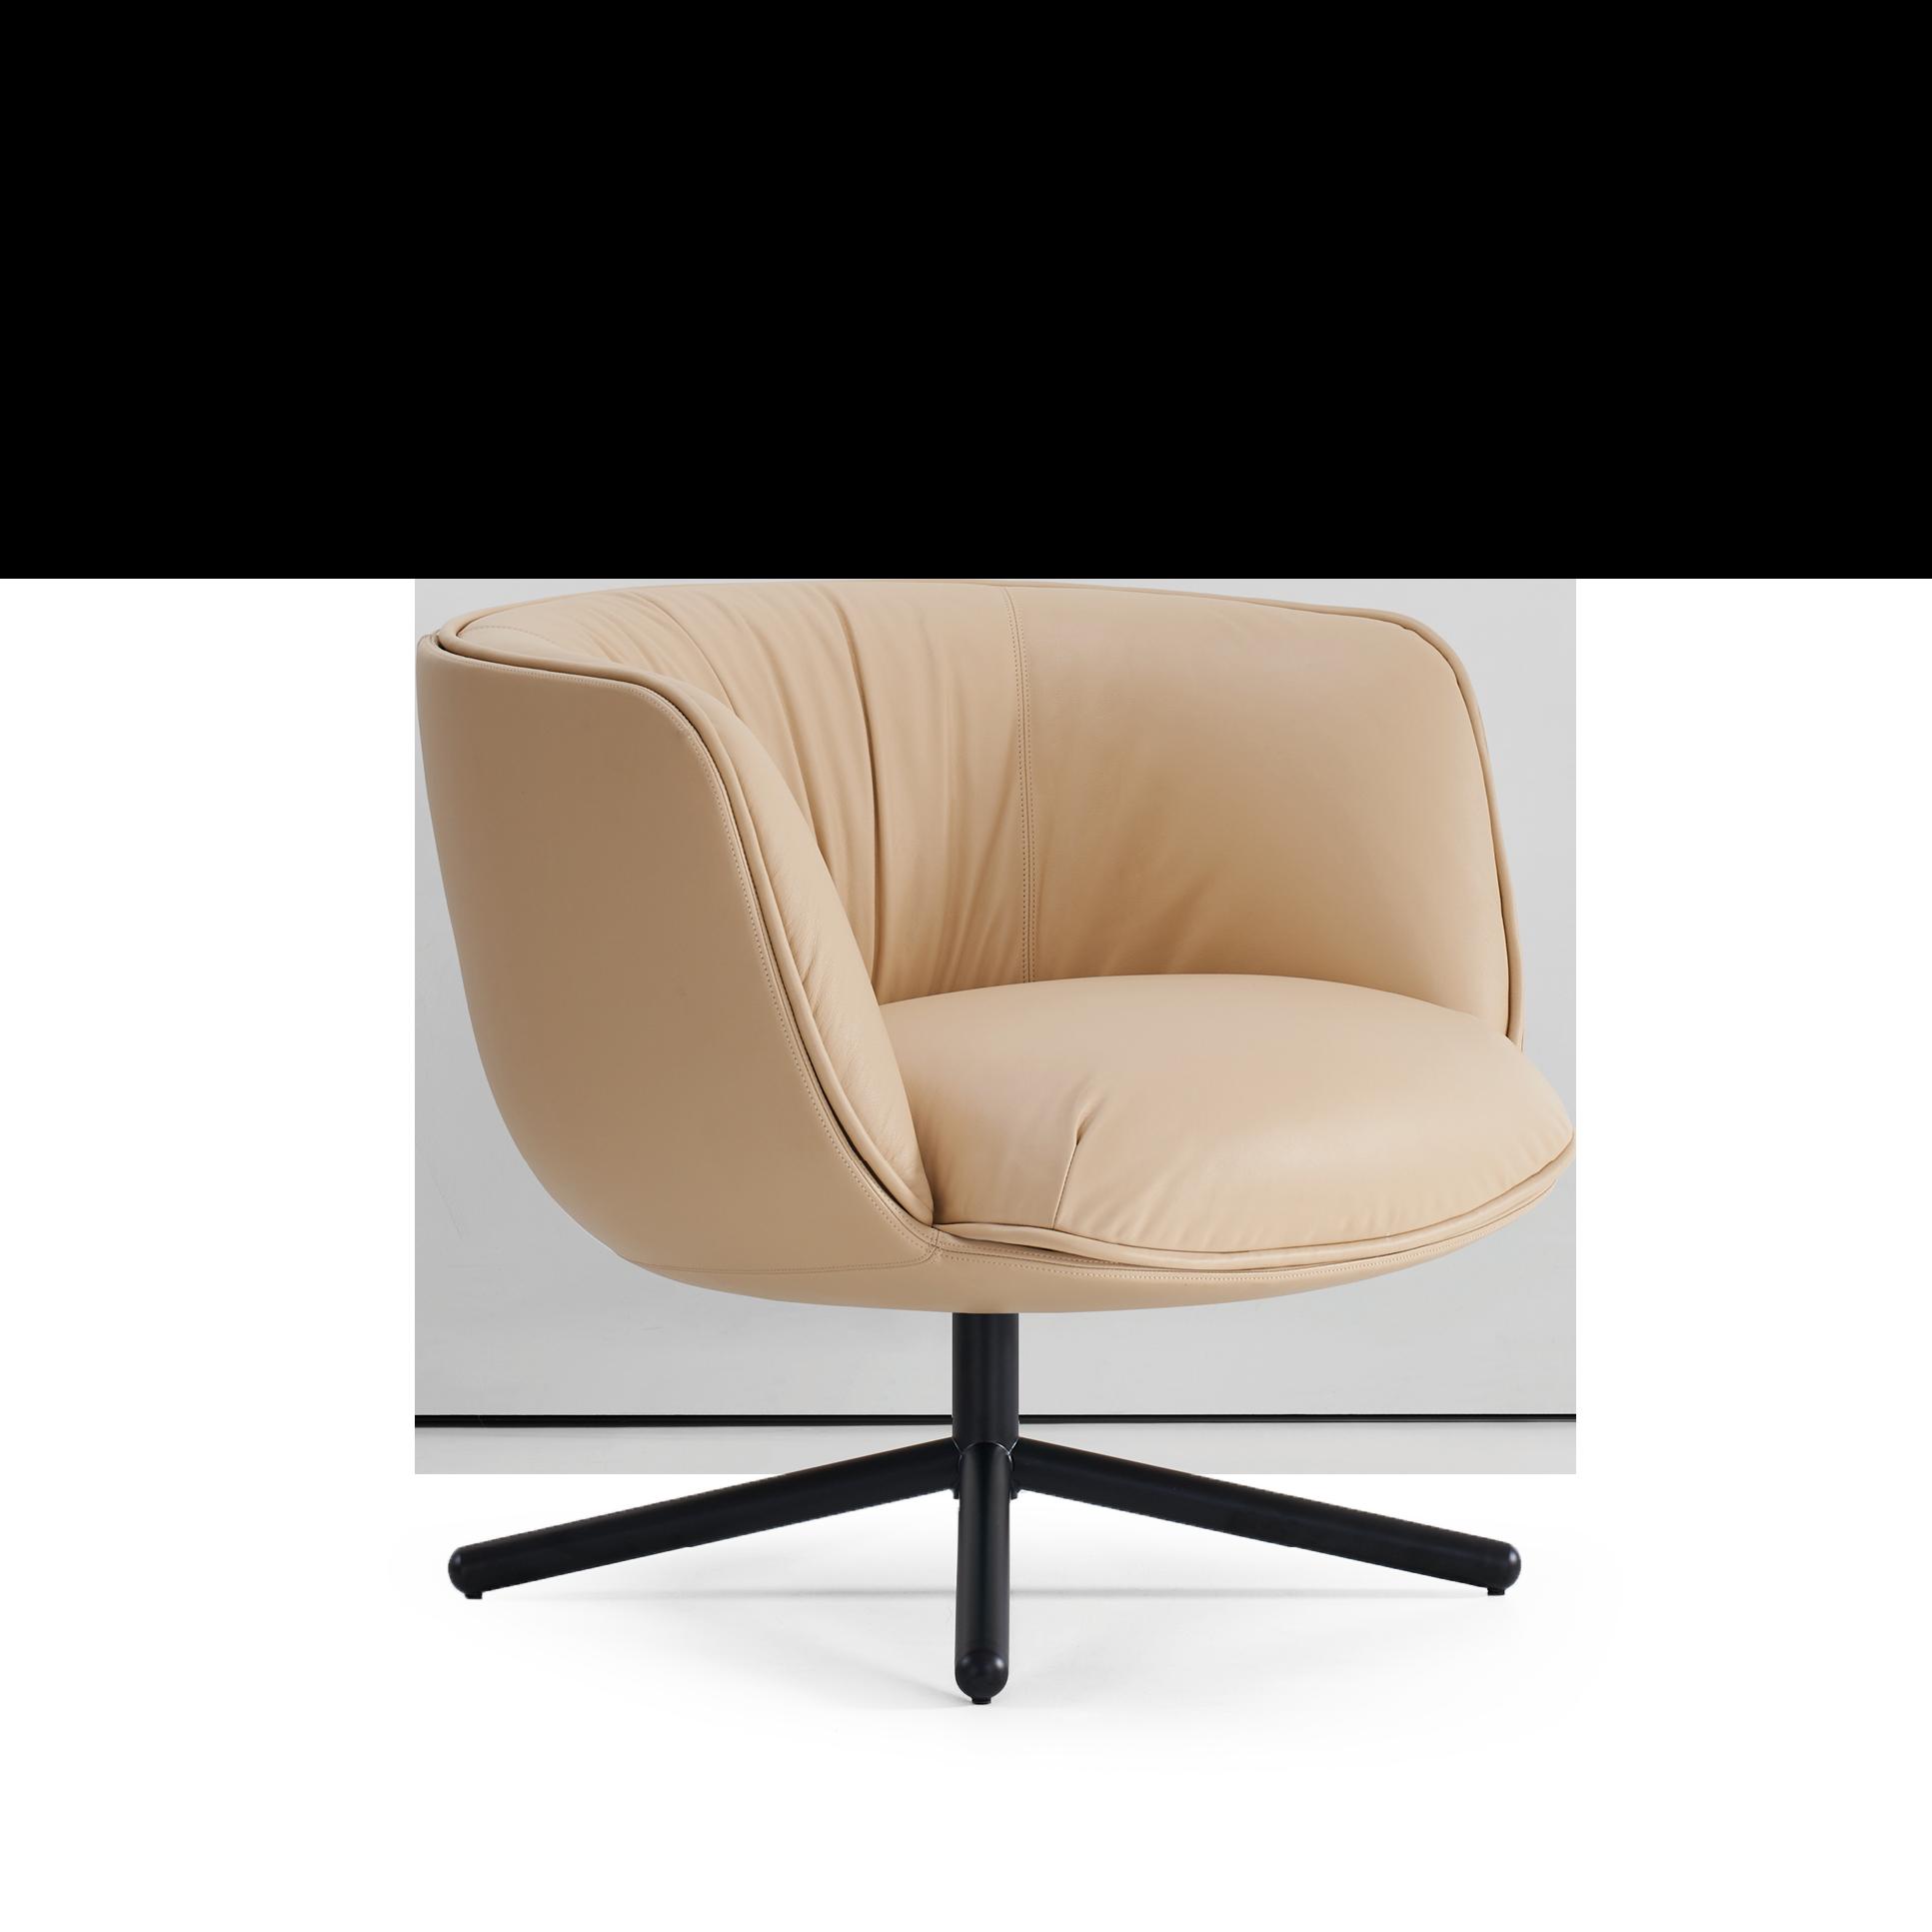 Seating: Bernhardt Bombom